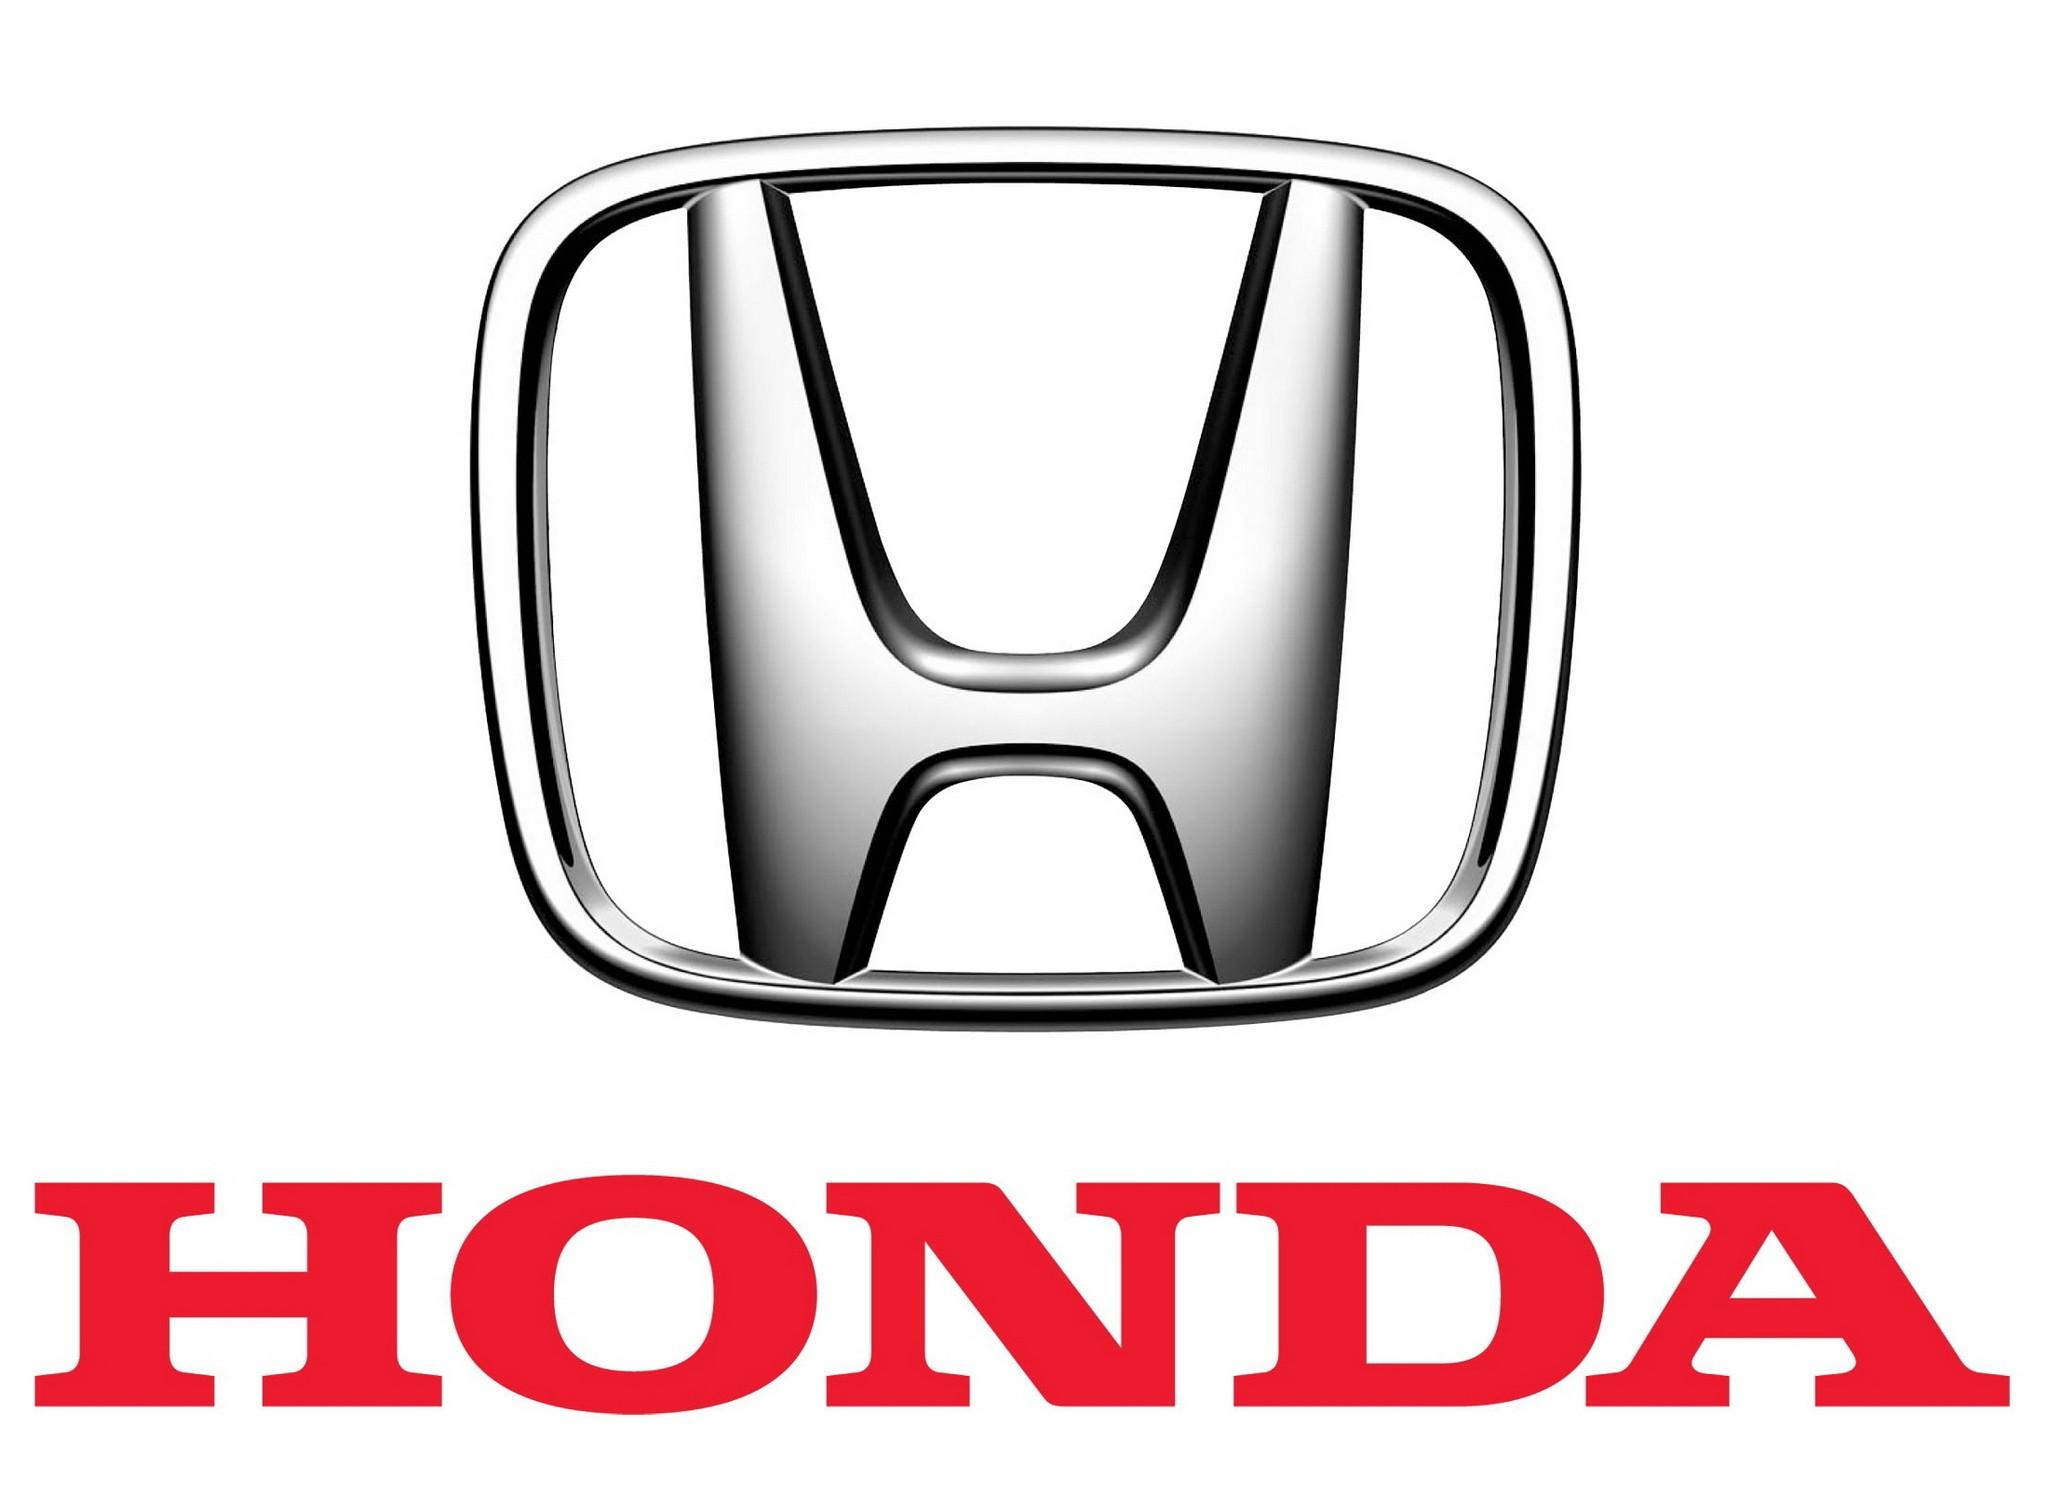 Honda Symbol Wallpaper